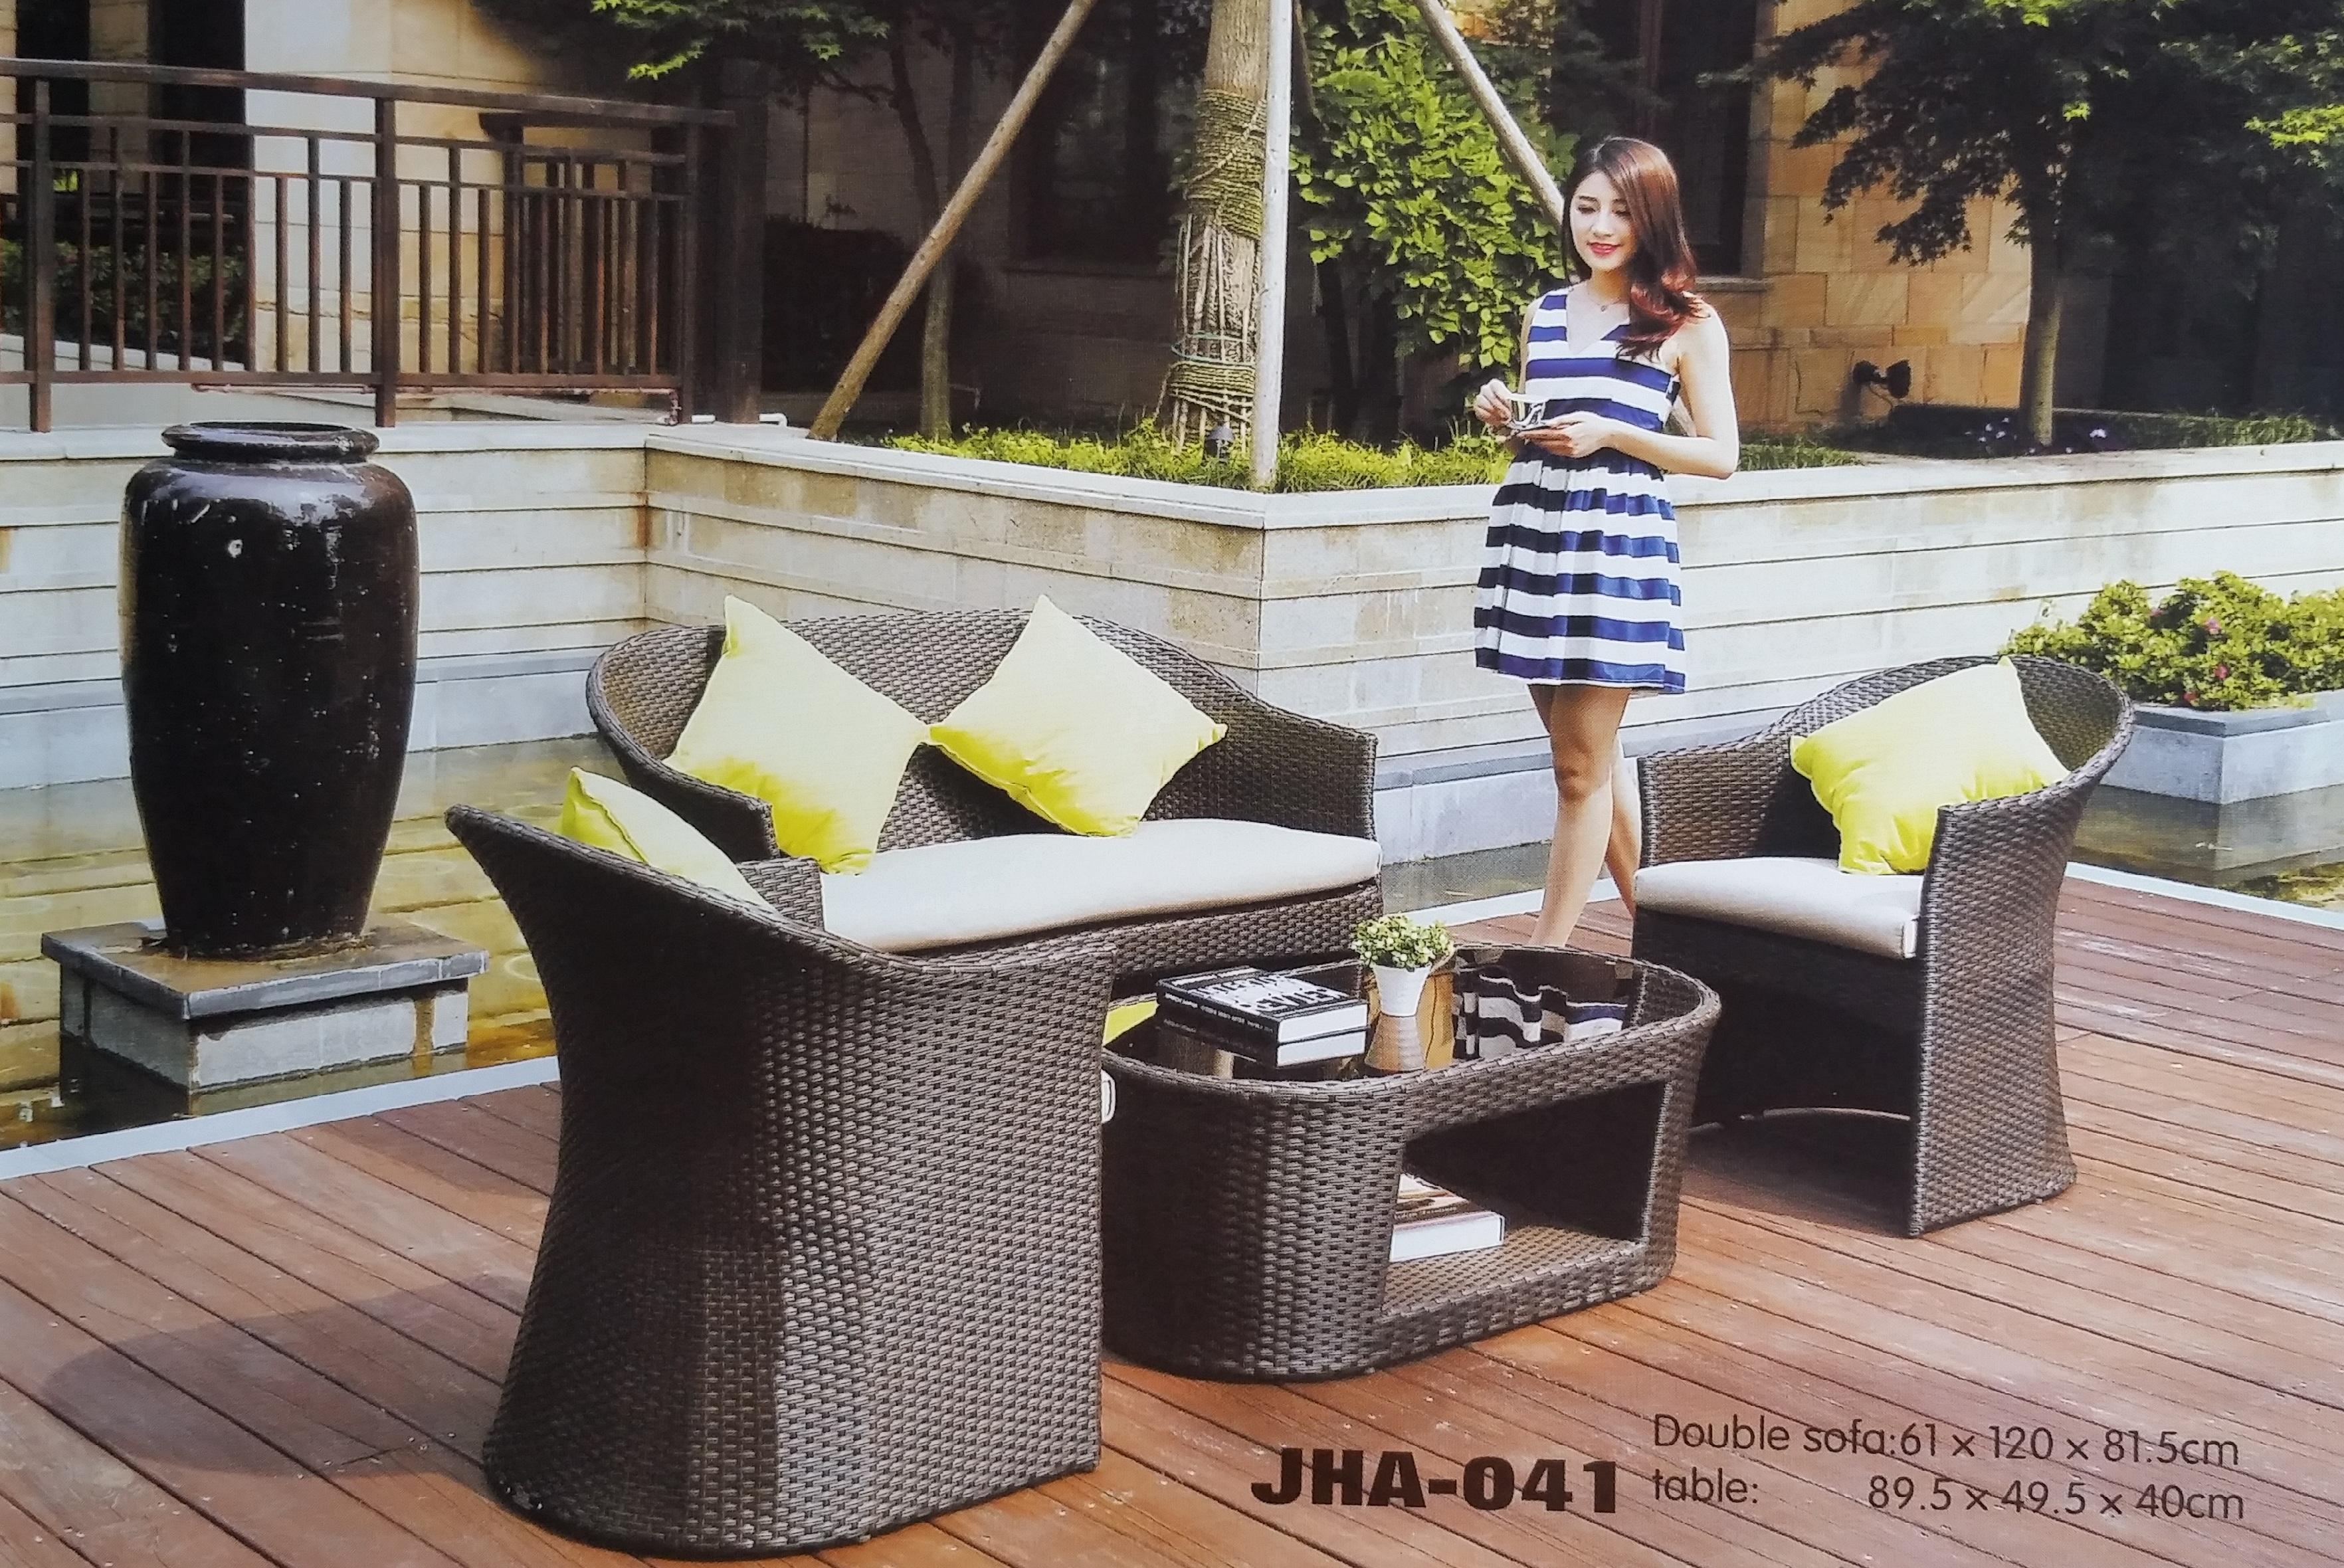 Outdoor Deck Sofa Set Outdoor Sofa Set Deck Furniture Patio Deck